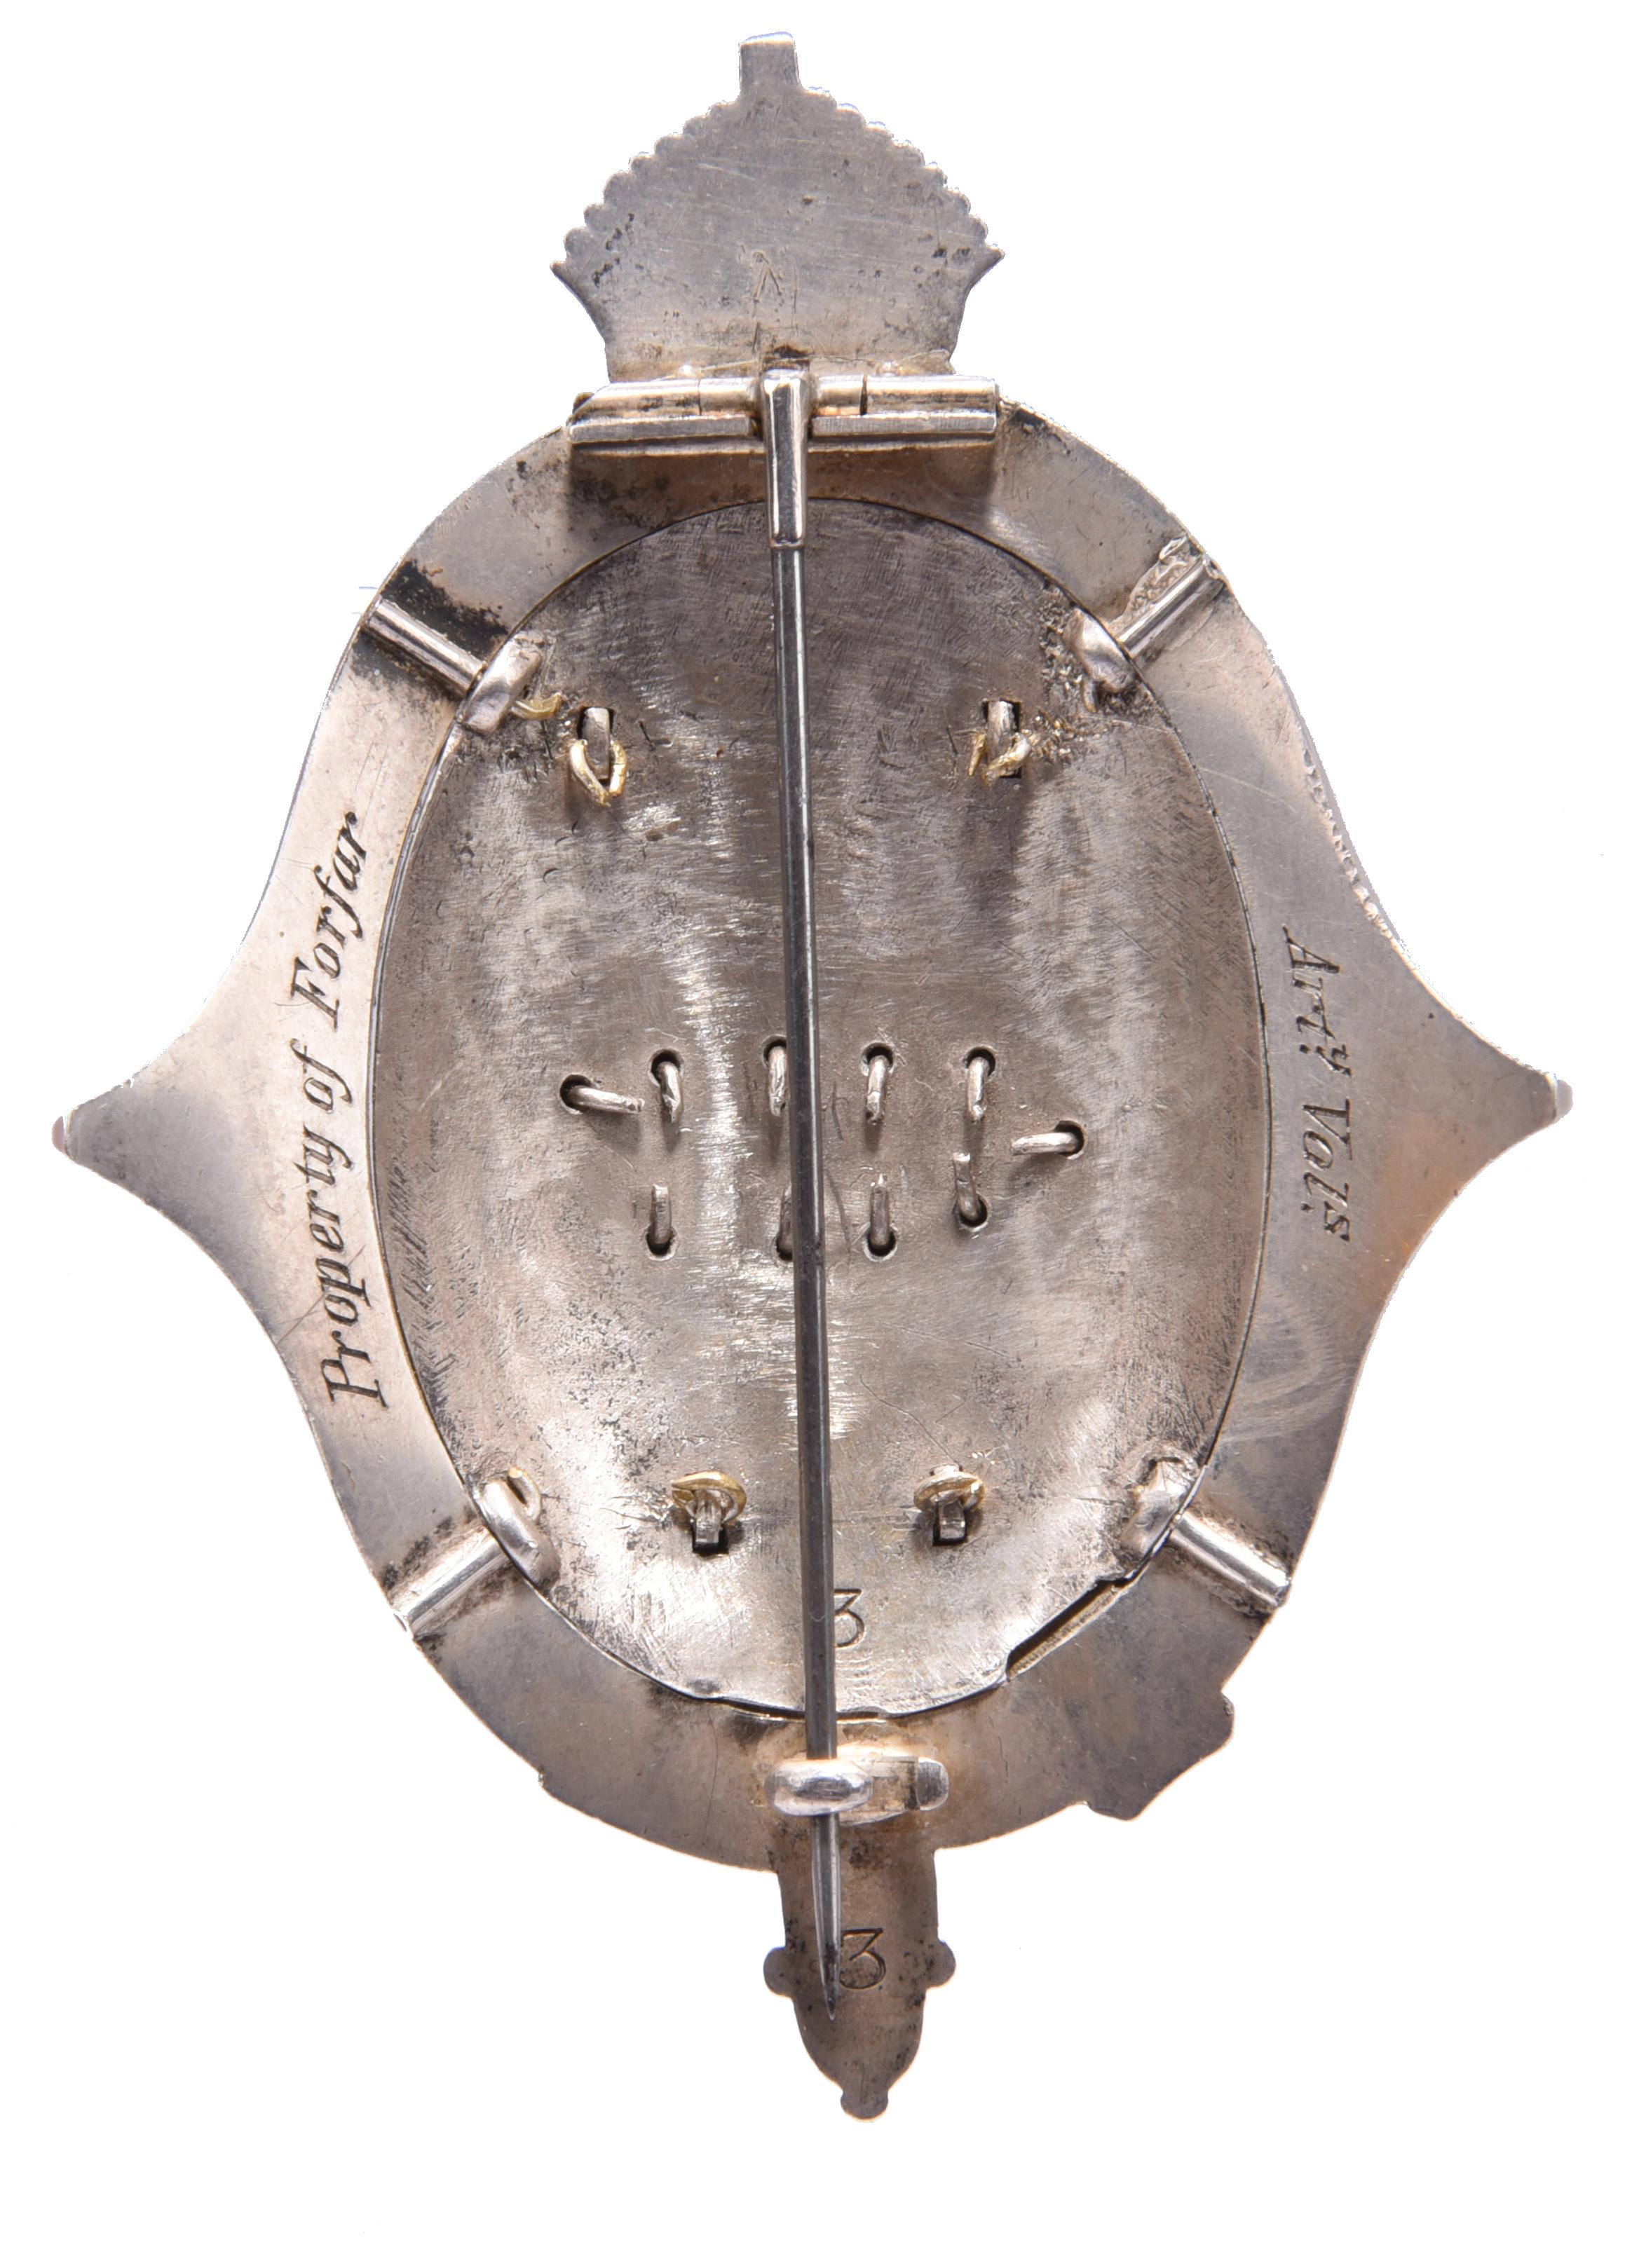 Forfar Artillery Volunteers/Royal HighlandShow: Scotland's Cup 1870, a silver and enamel brooch, - Image 2 of 2